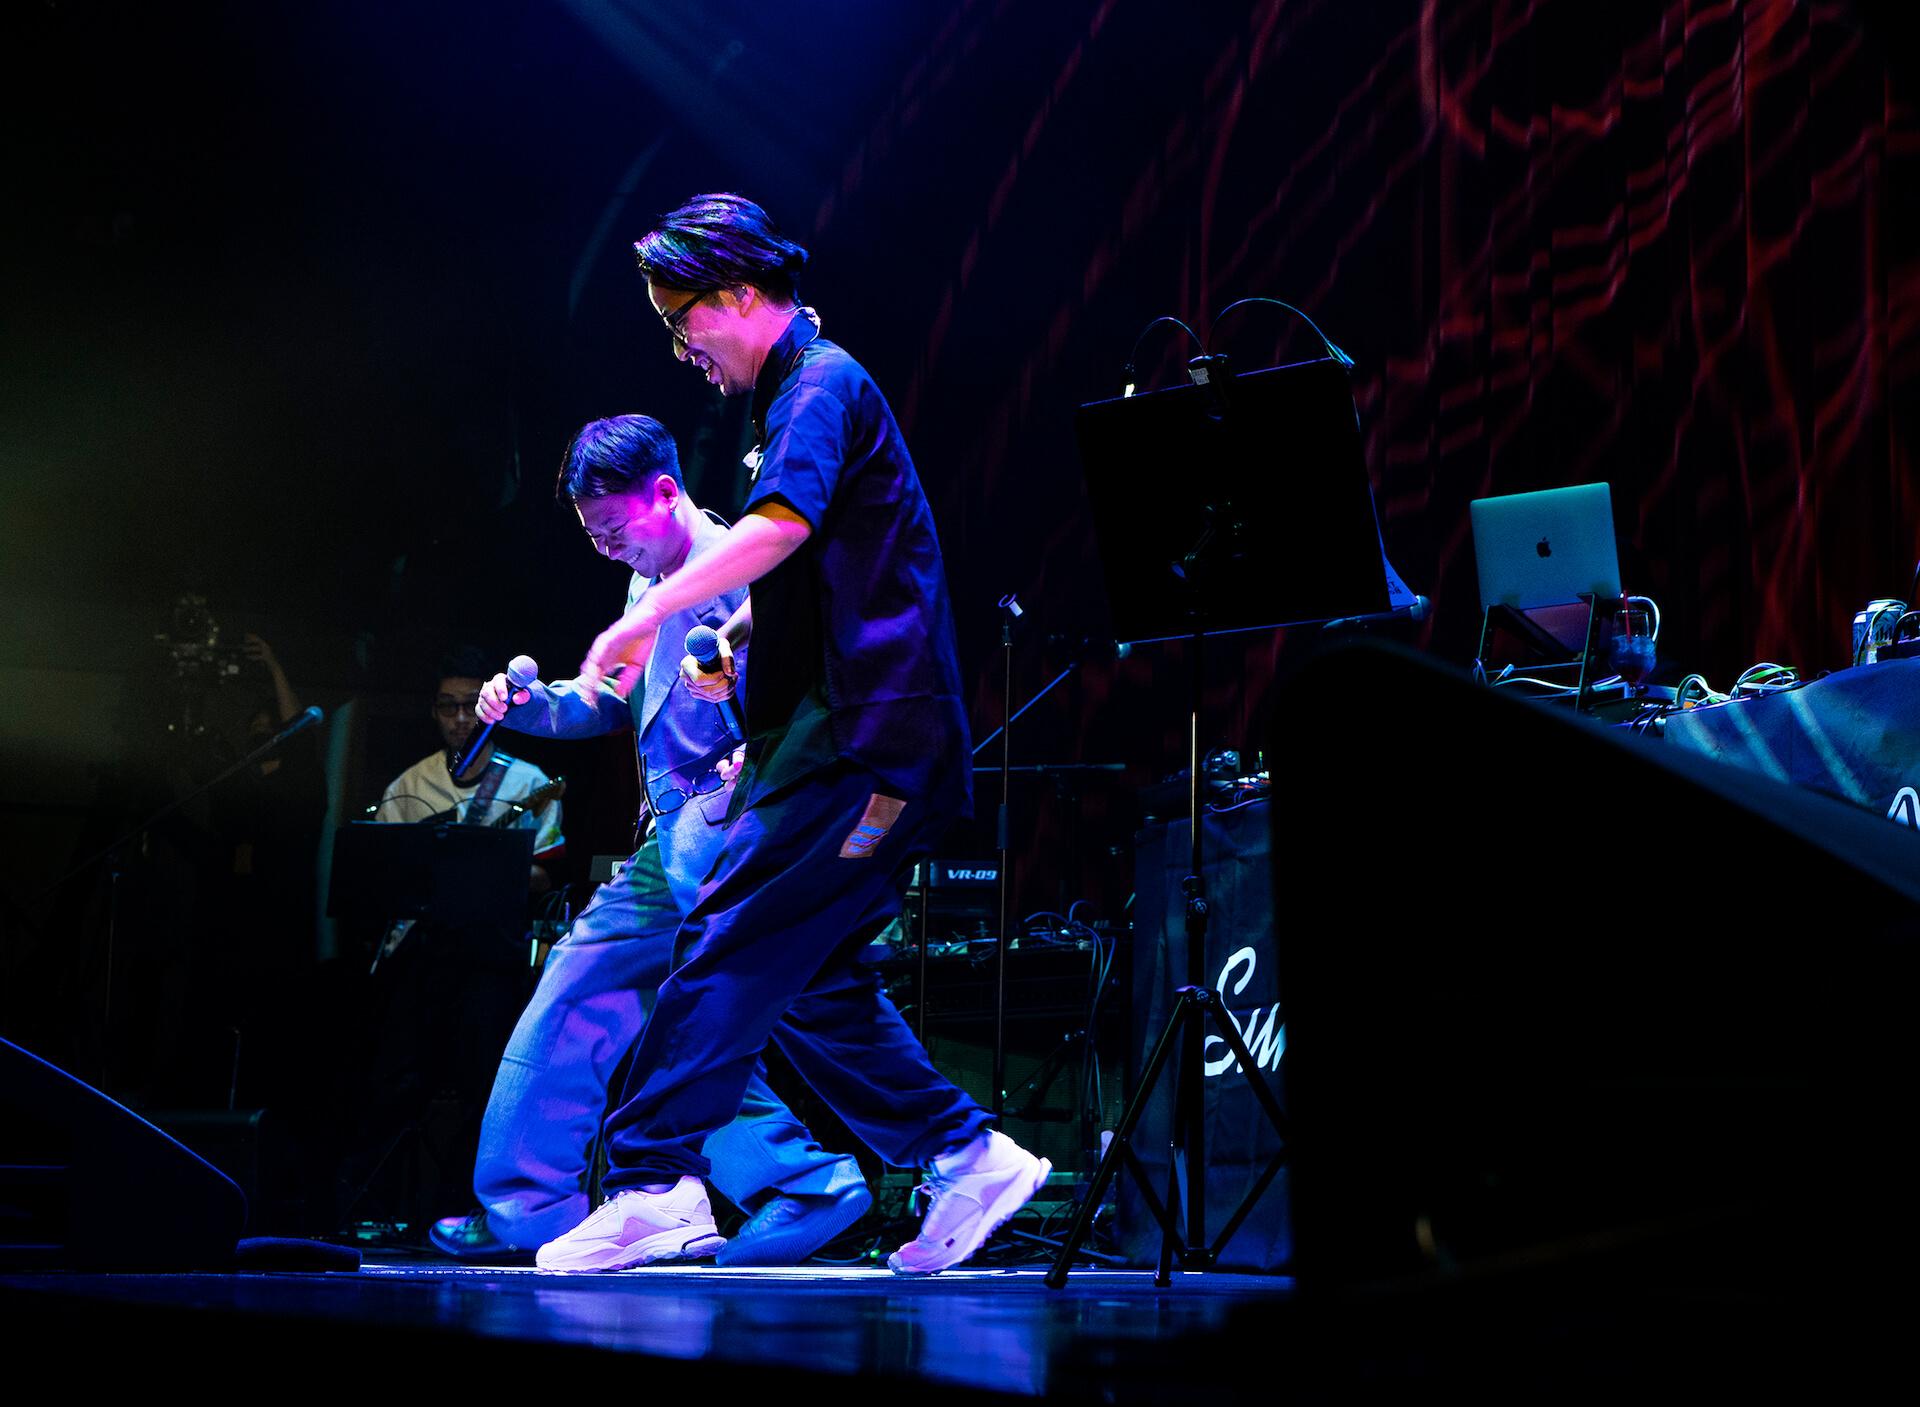 BIM初のビルボードライブ公演のライブレポートが到着!バンドセットでPUNPEE、kZm、STUTSらと共演 music201112_bim_live_12